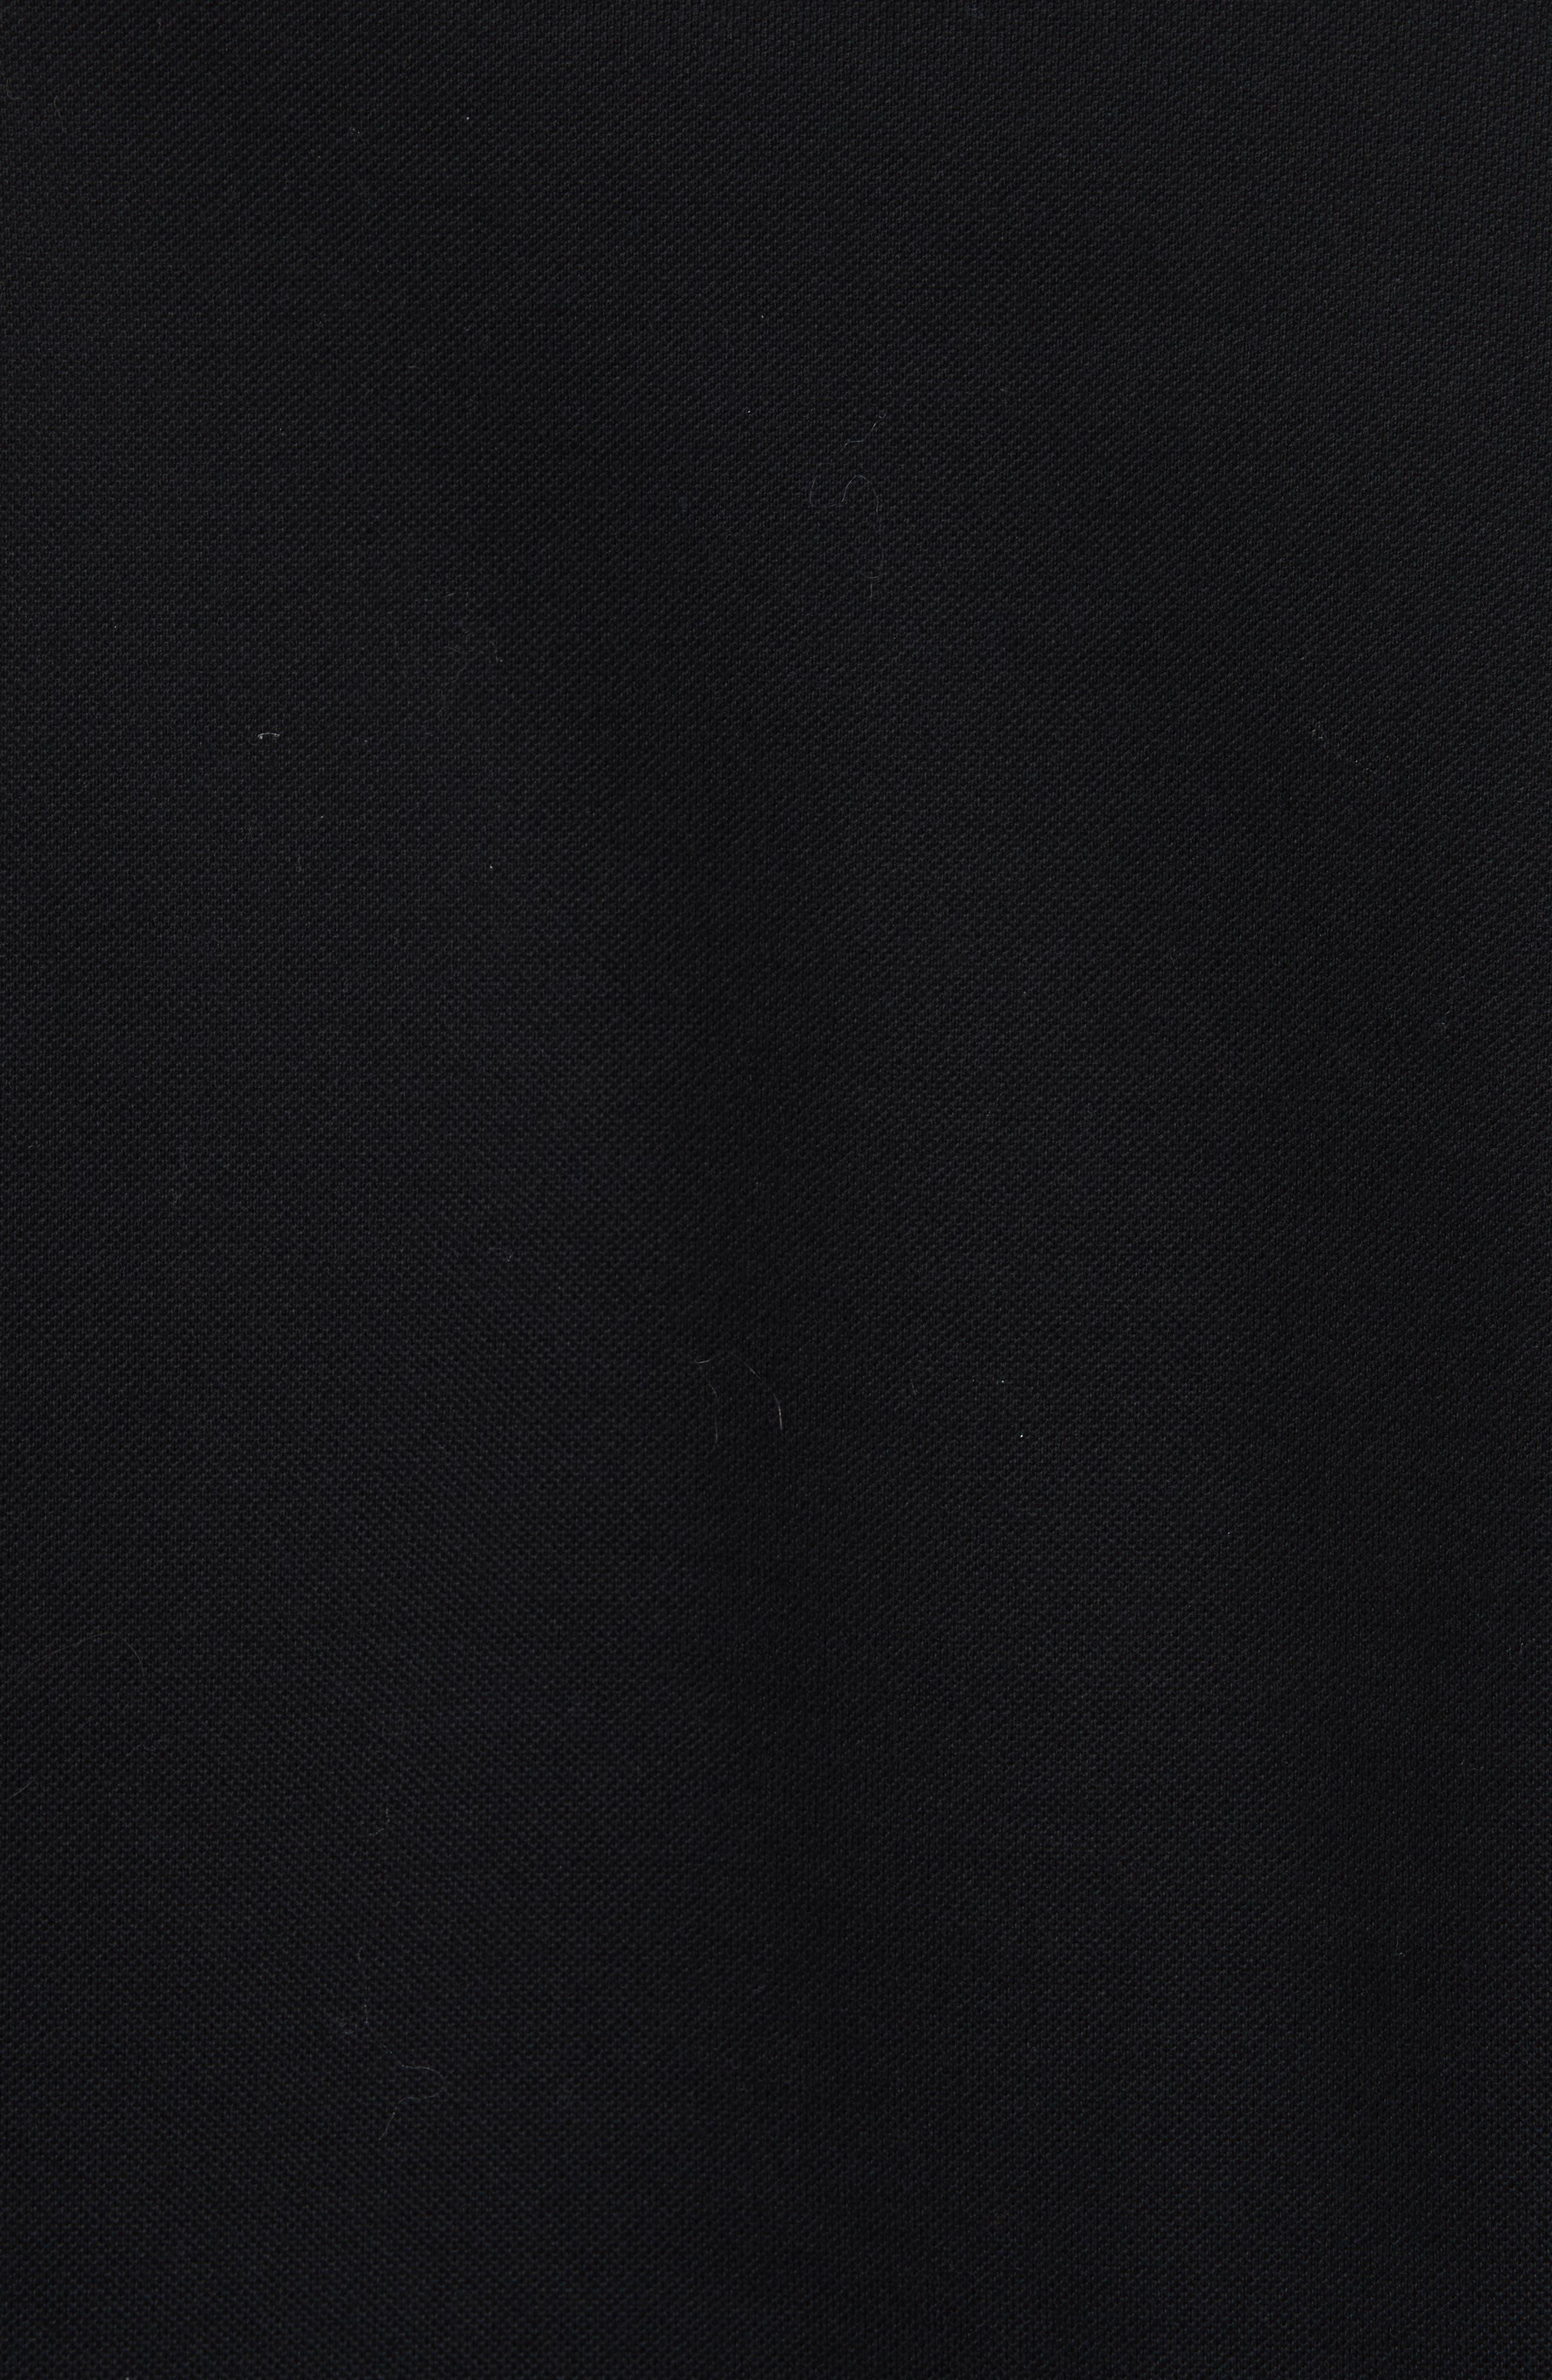 Foiled V-Print Polo,                             Alternate thumbnail 5, color,                             Black